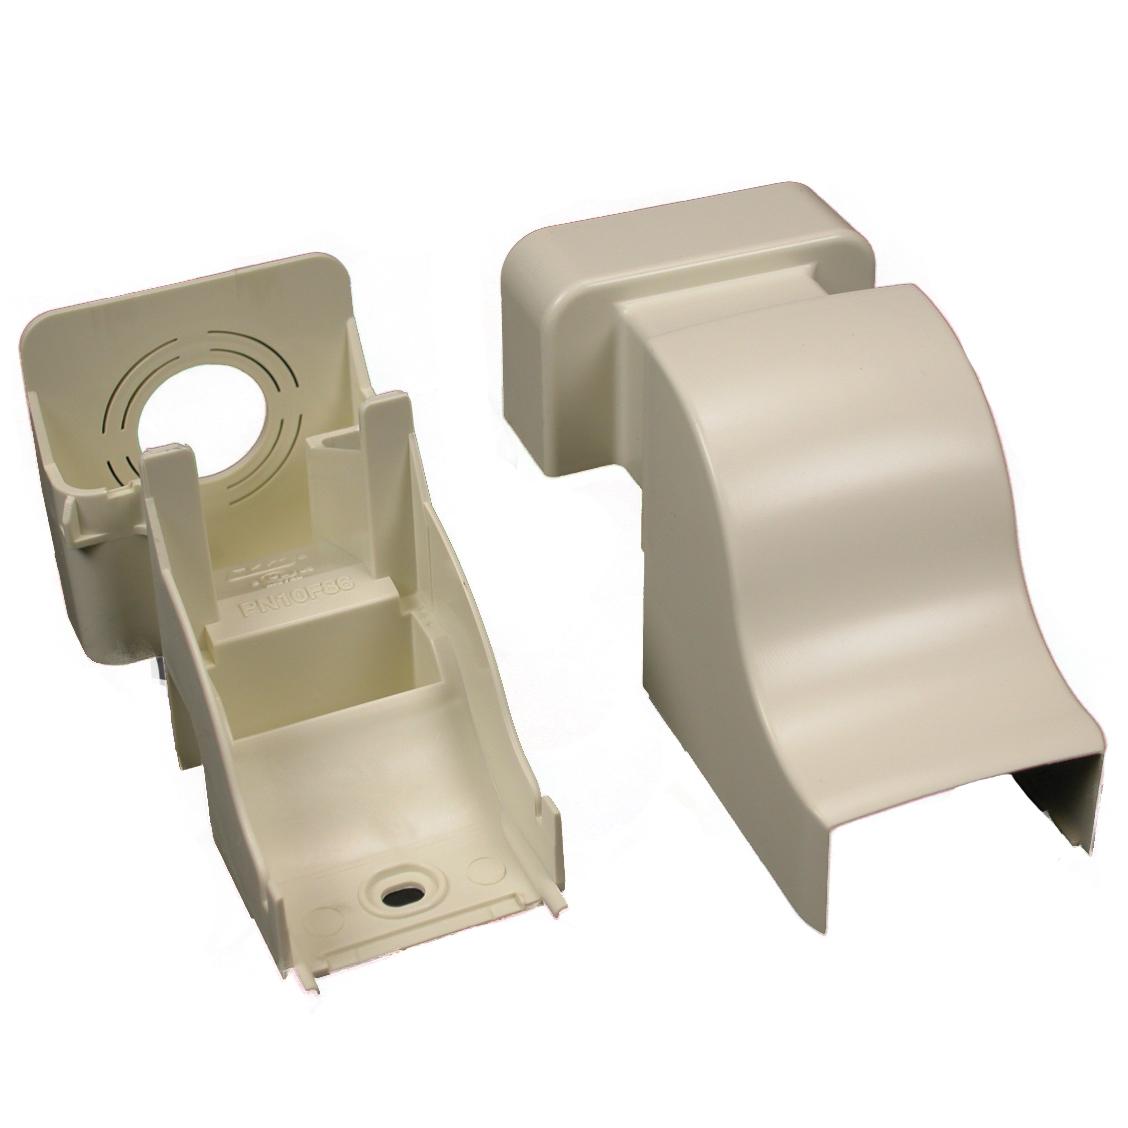 Eclipse™ PN03, PN05, PN10 Series Drop Ceiling Connector